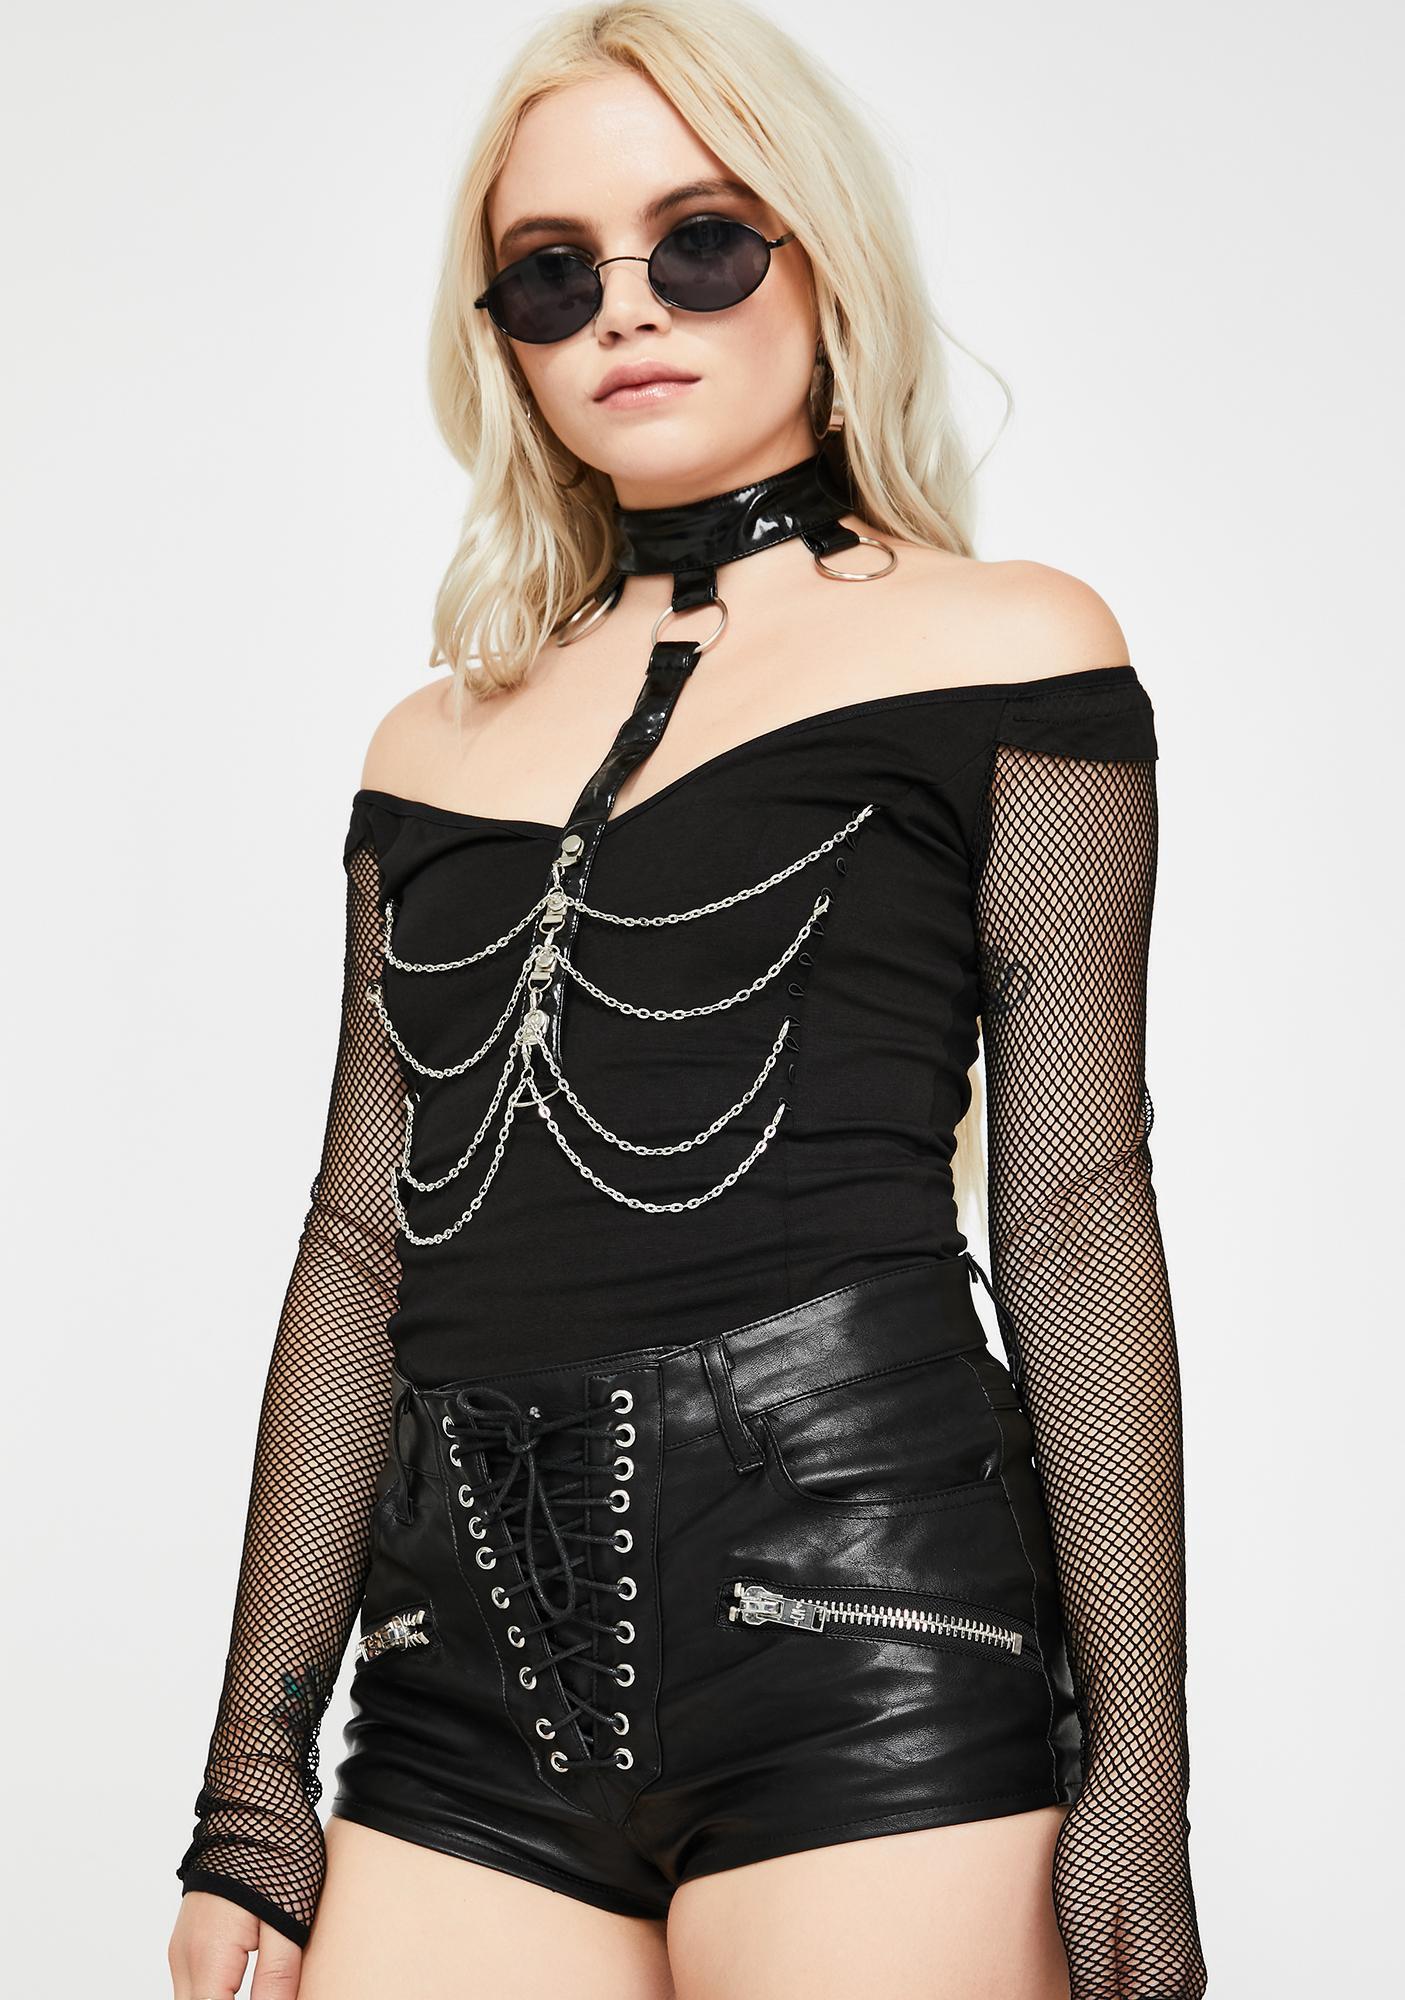 Devil Fashion Fishnet Sleeve Chain Harness Top